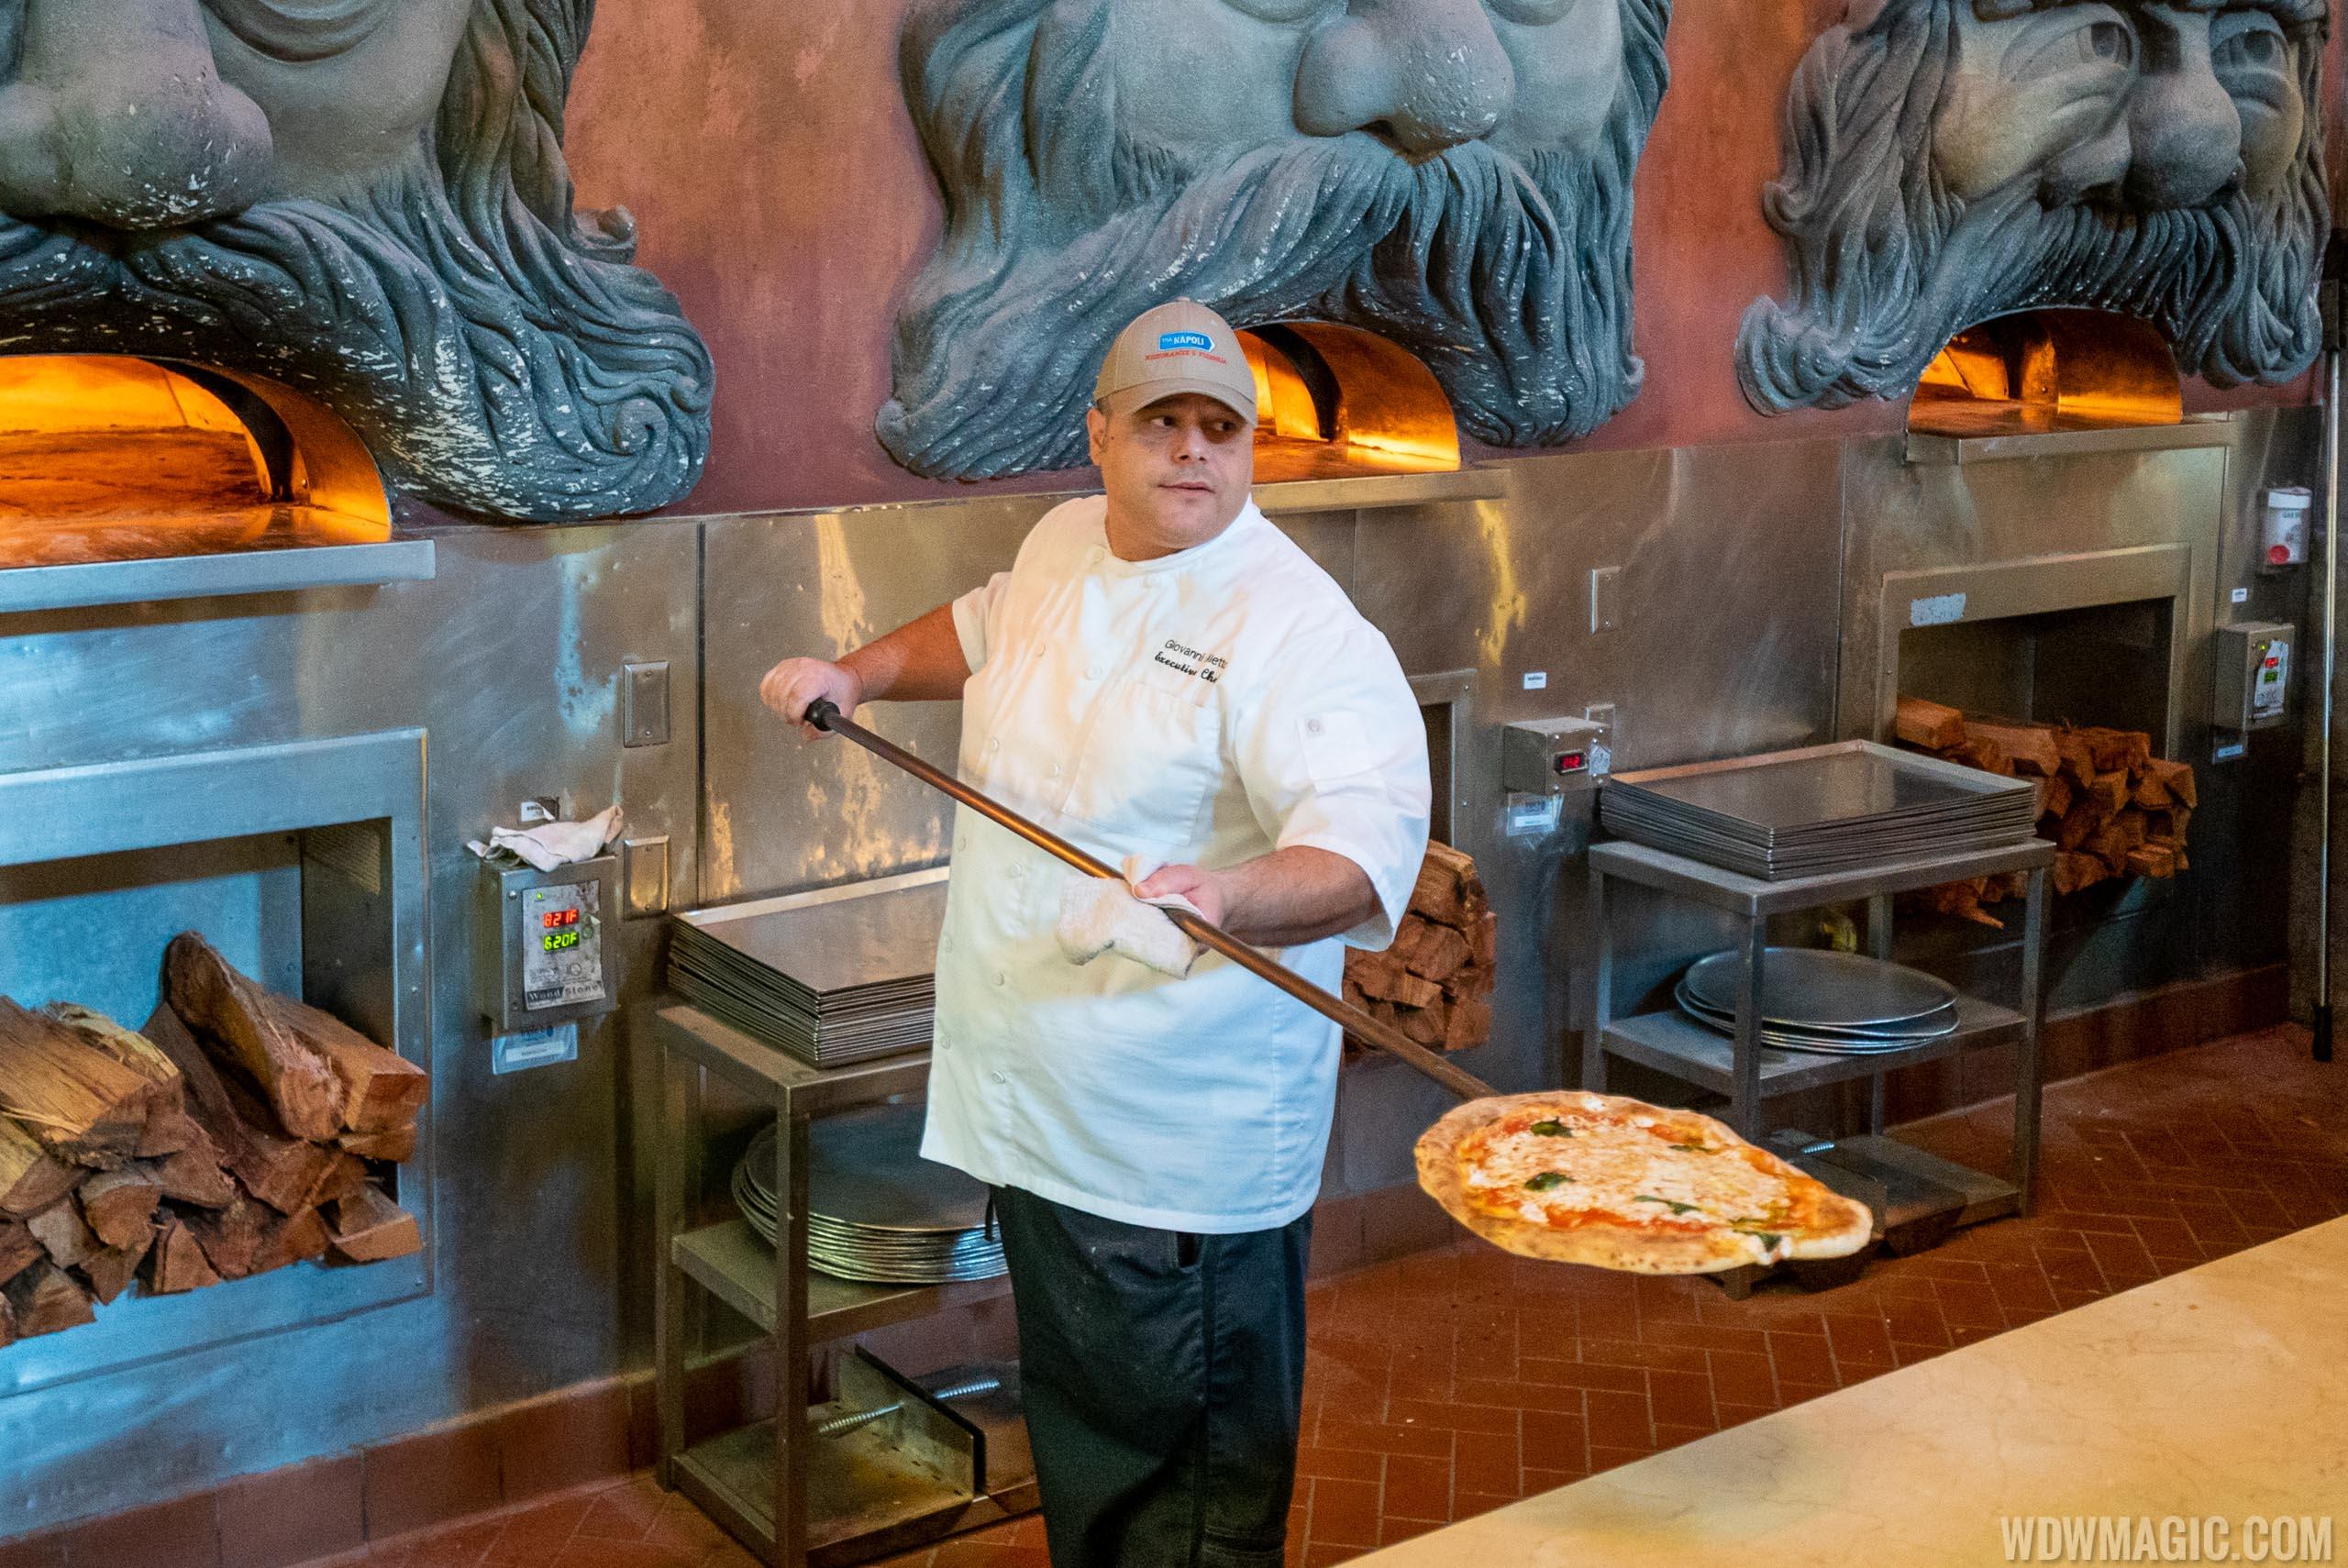 Via Napoli Executive Chef Giovanni Aletto displays the perfect pizza fresh from the oven